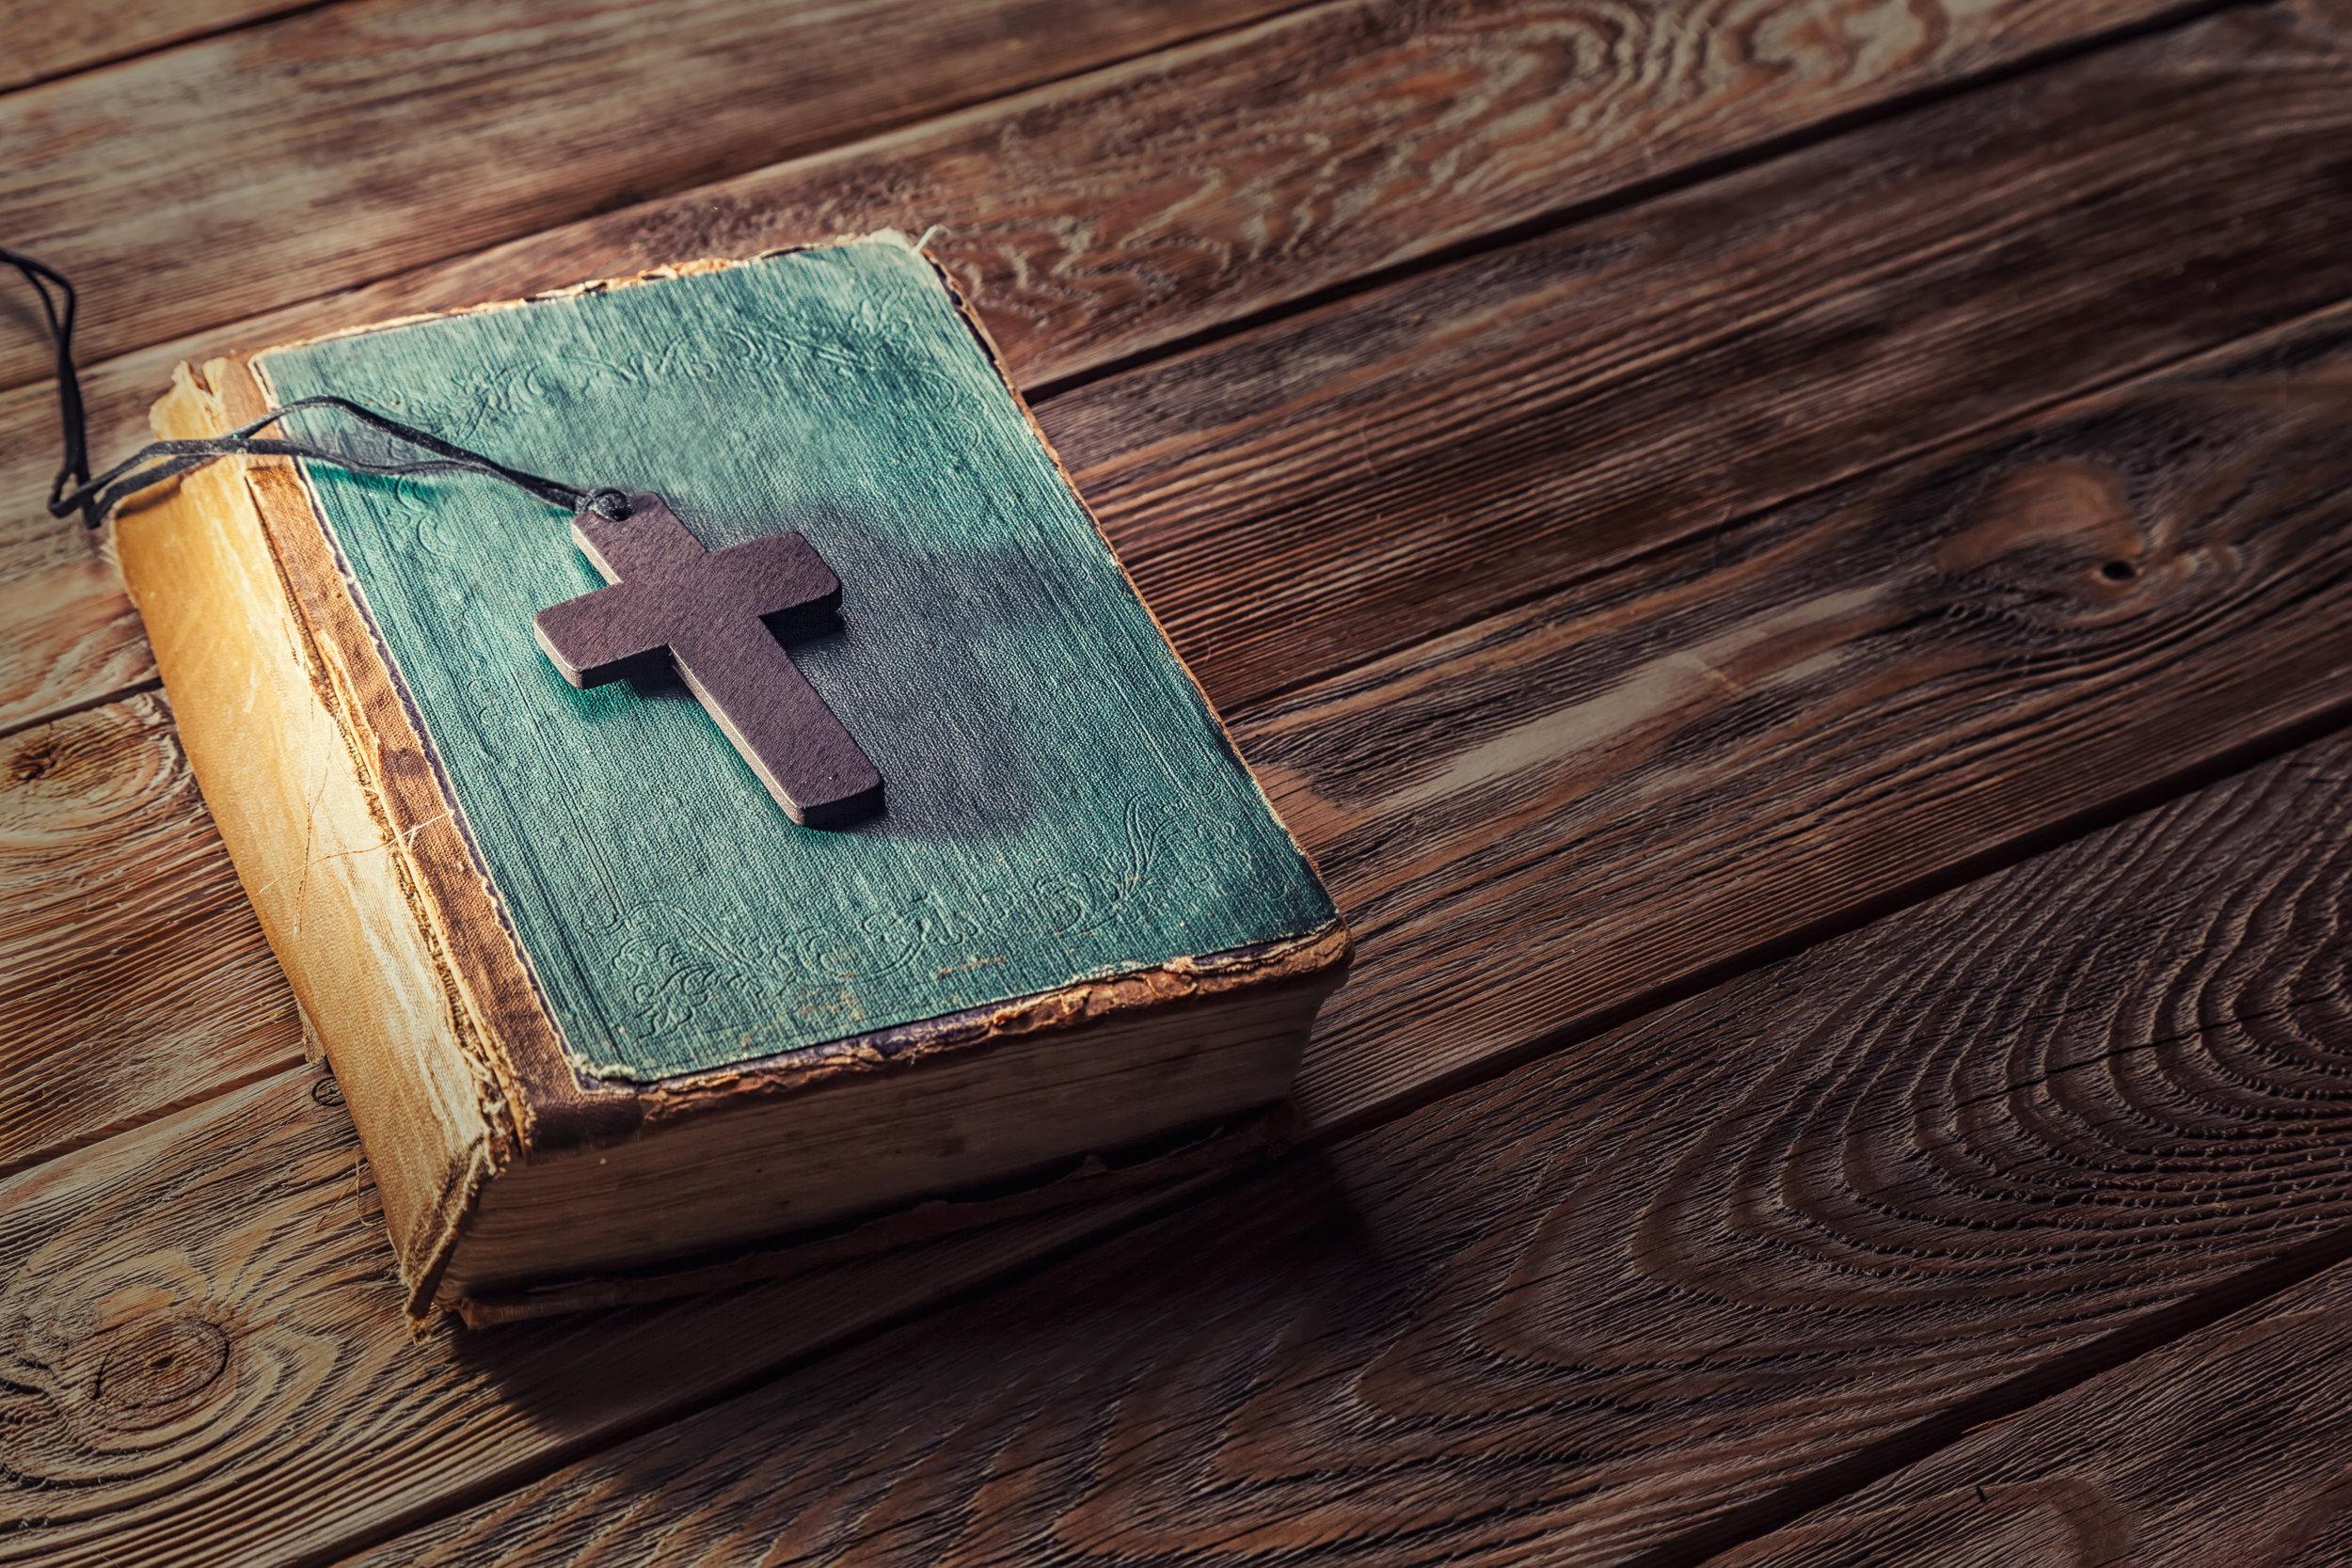 bigstock-Christian-cross-on-bible-105120932.jpg